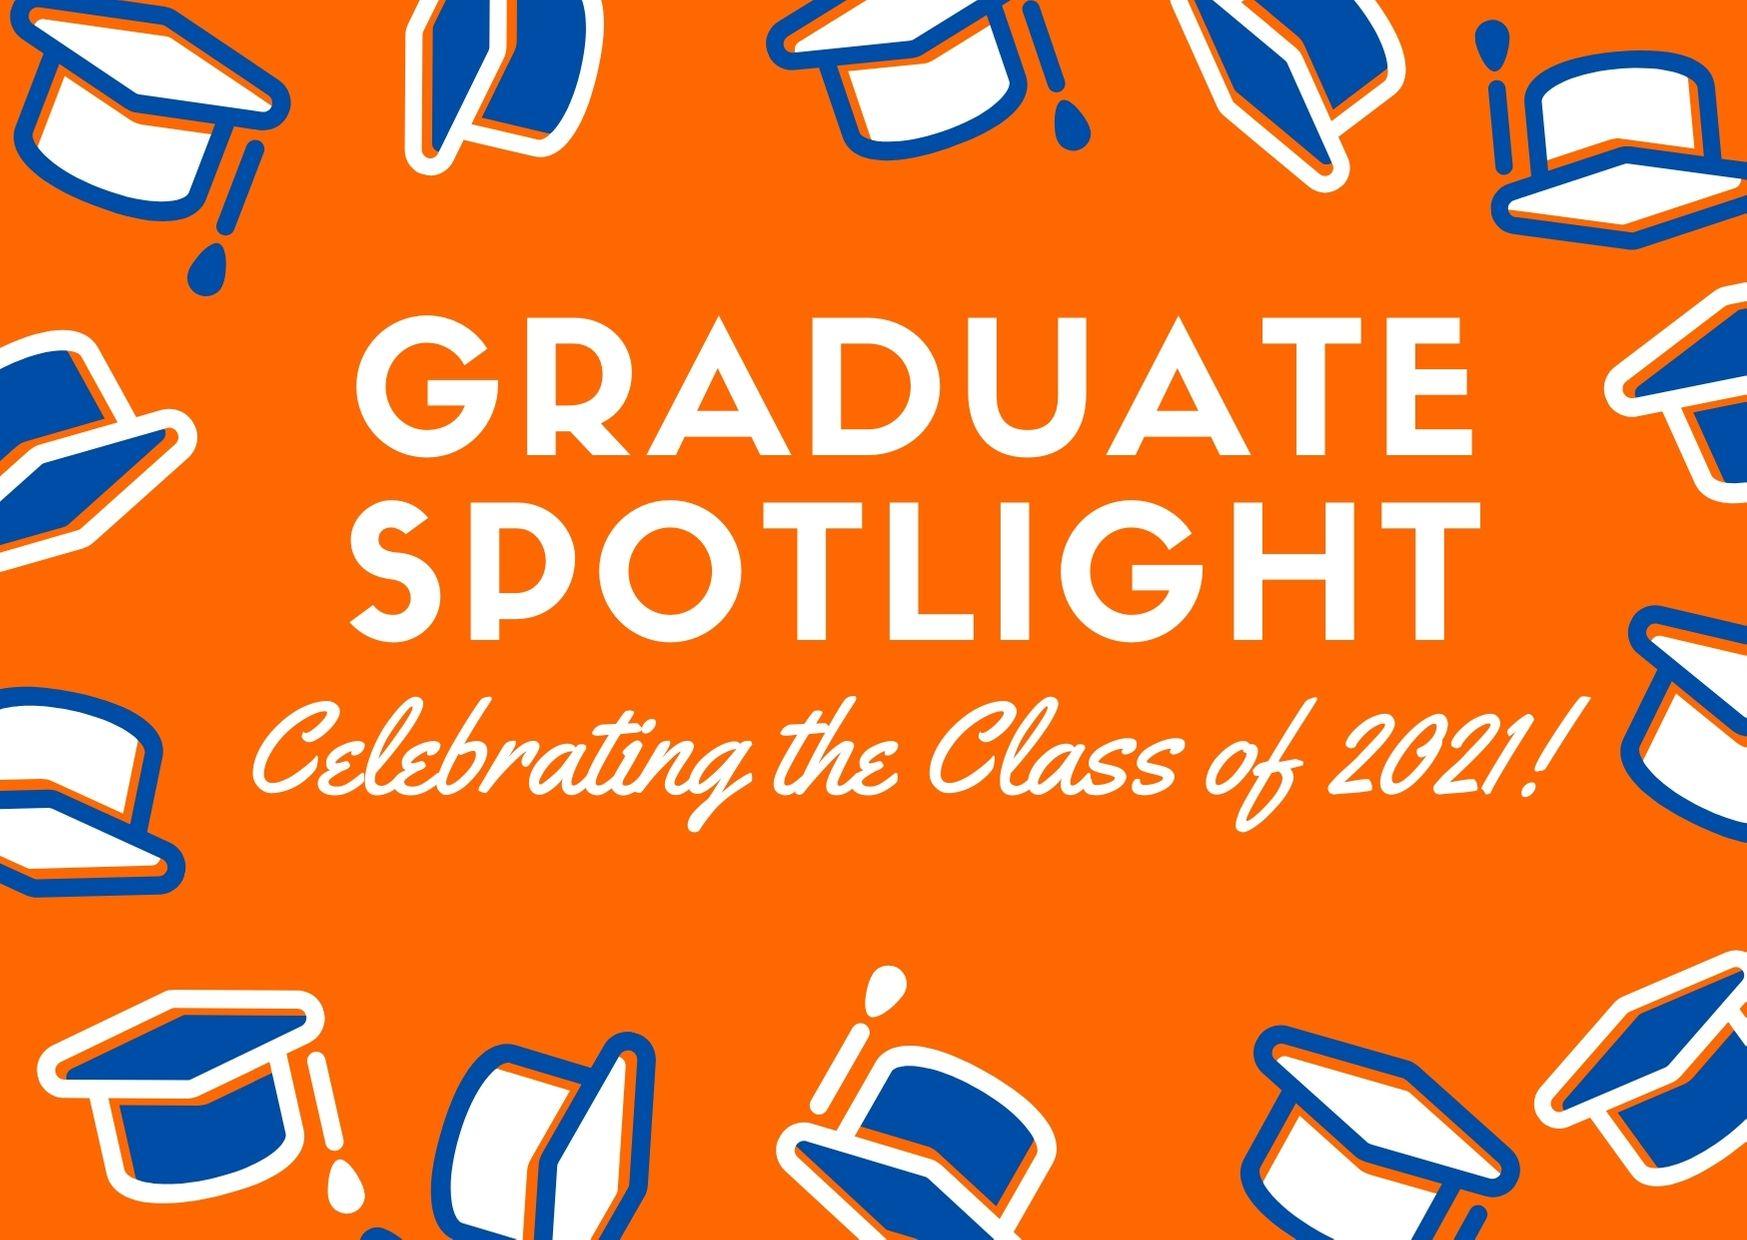 Graduate Spotlight